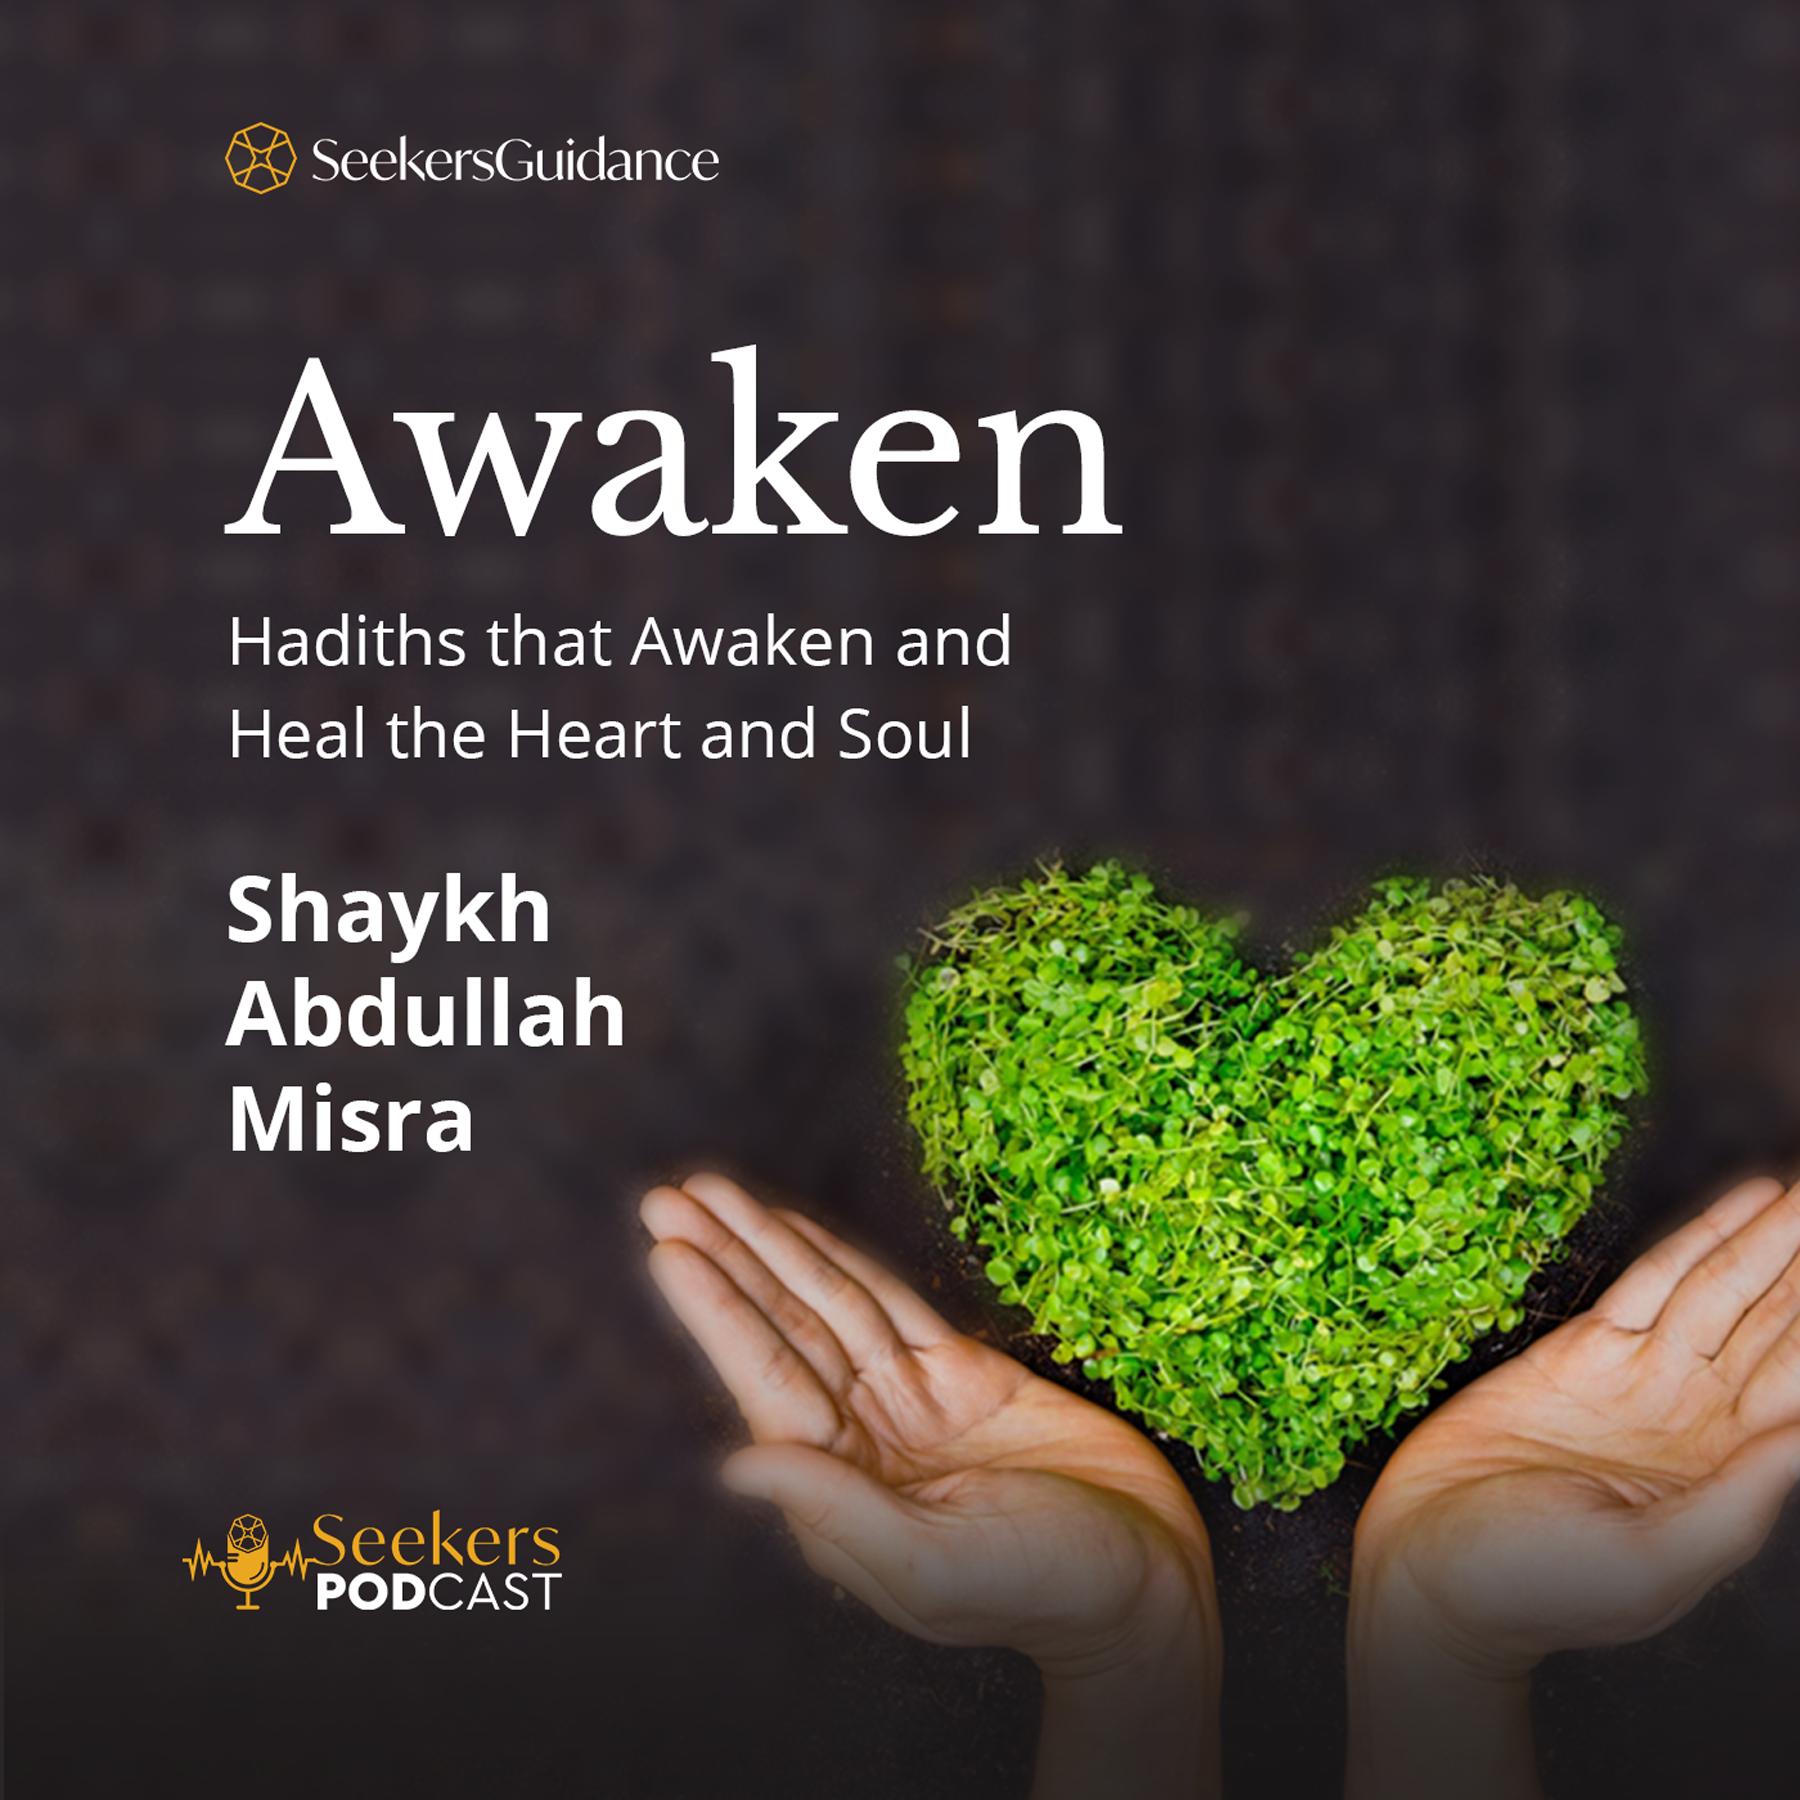 Awaken! : Hadiths to Awaken and Heal the Heart and Soul